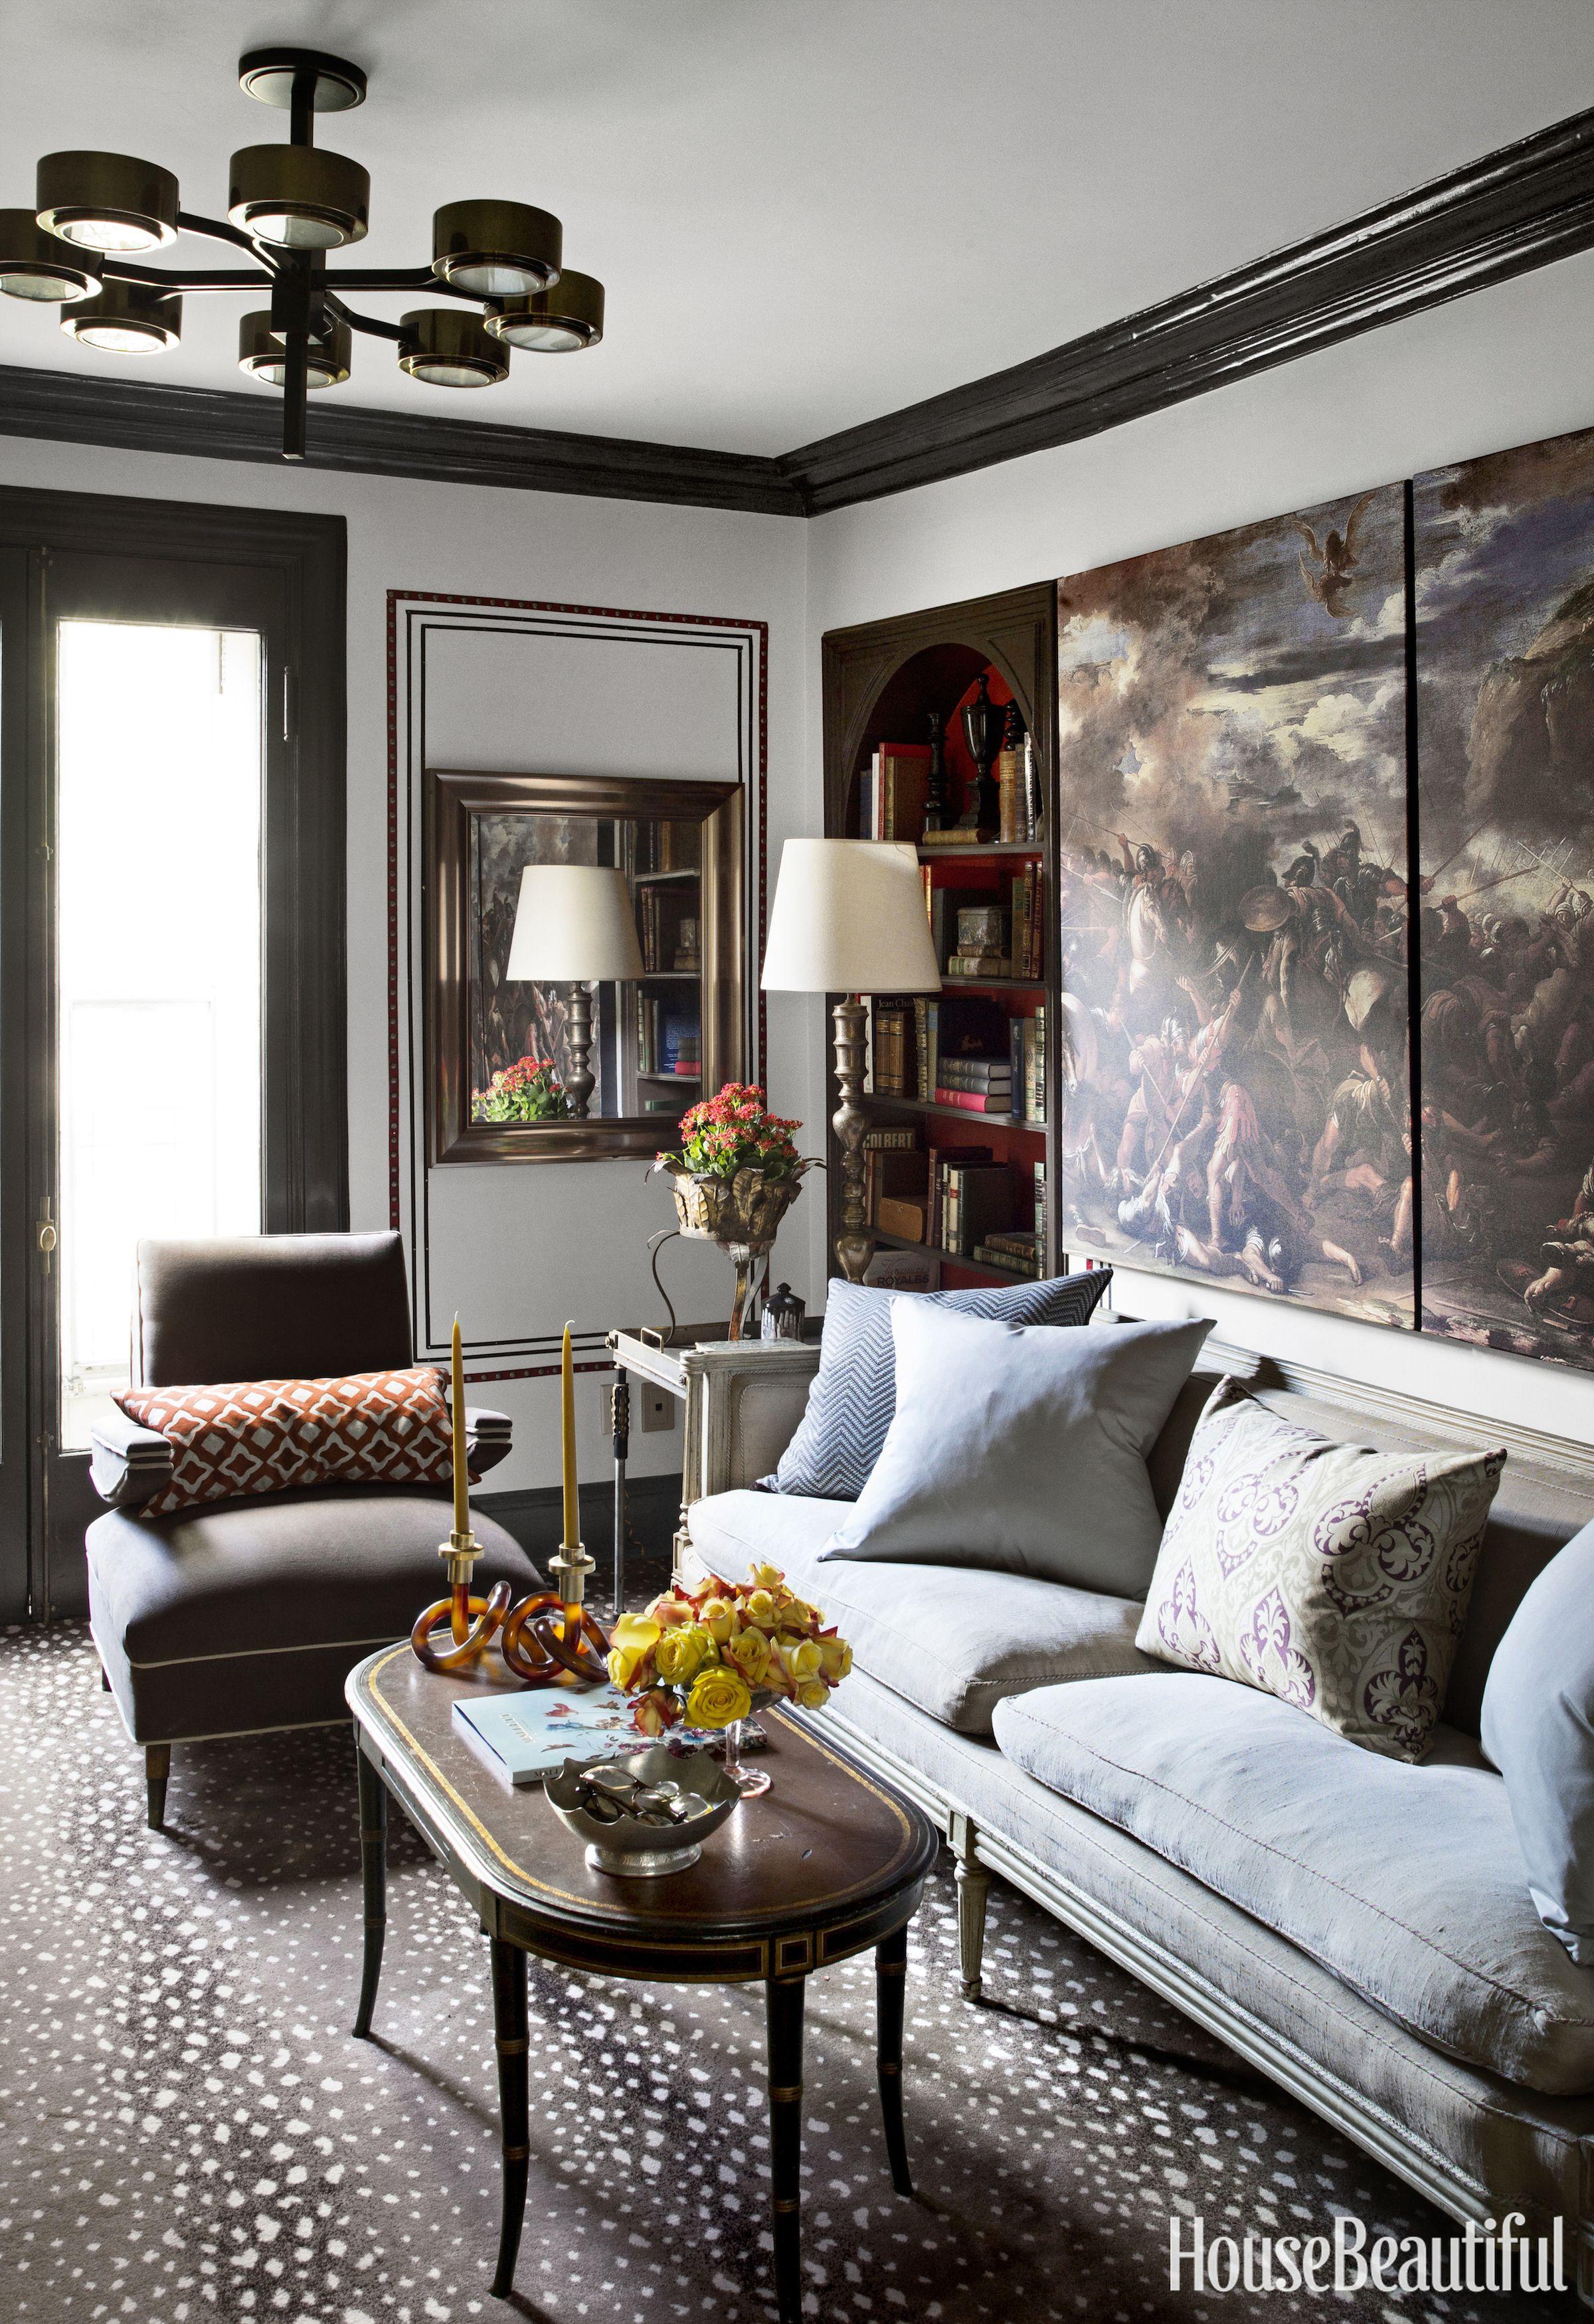 Living room inspiration small living room set with a traditional sofa modern sofas modernsofas livingroomfurnitureset traditionalsofa